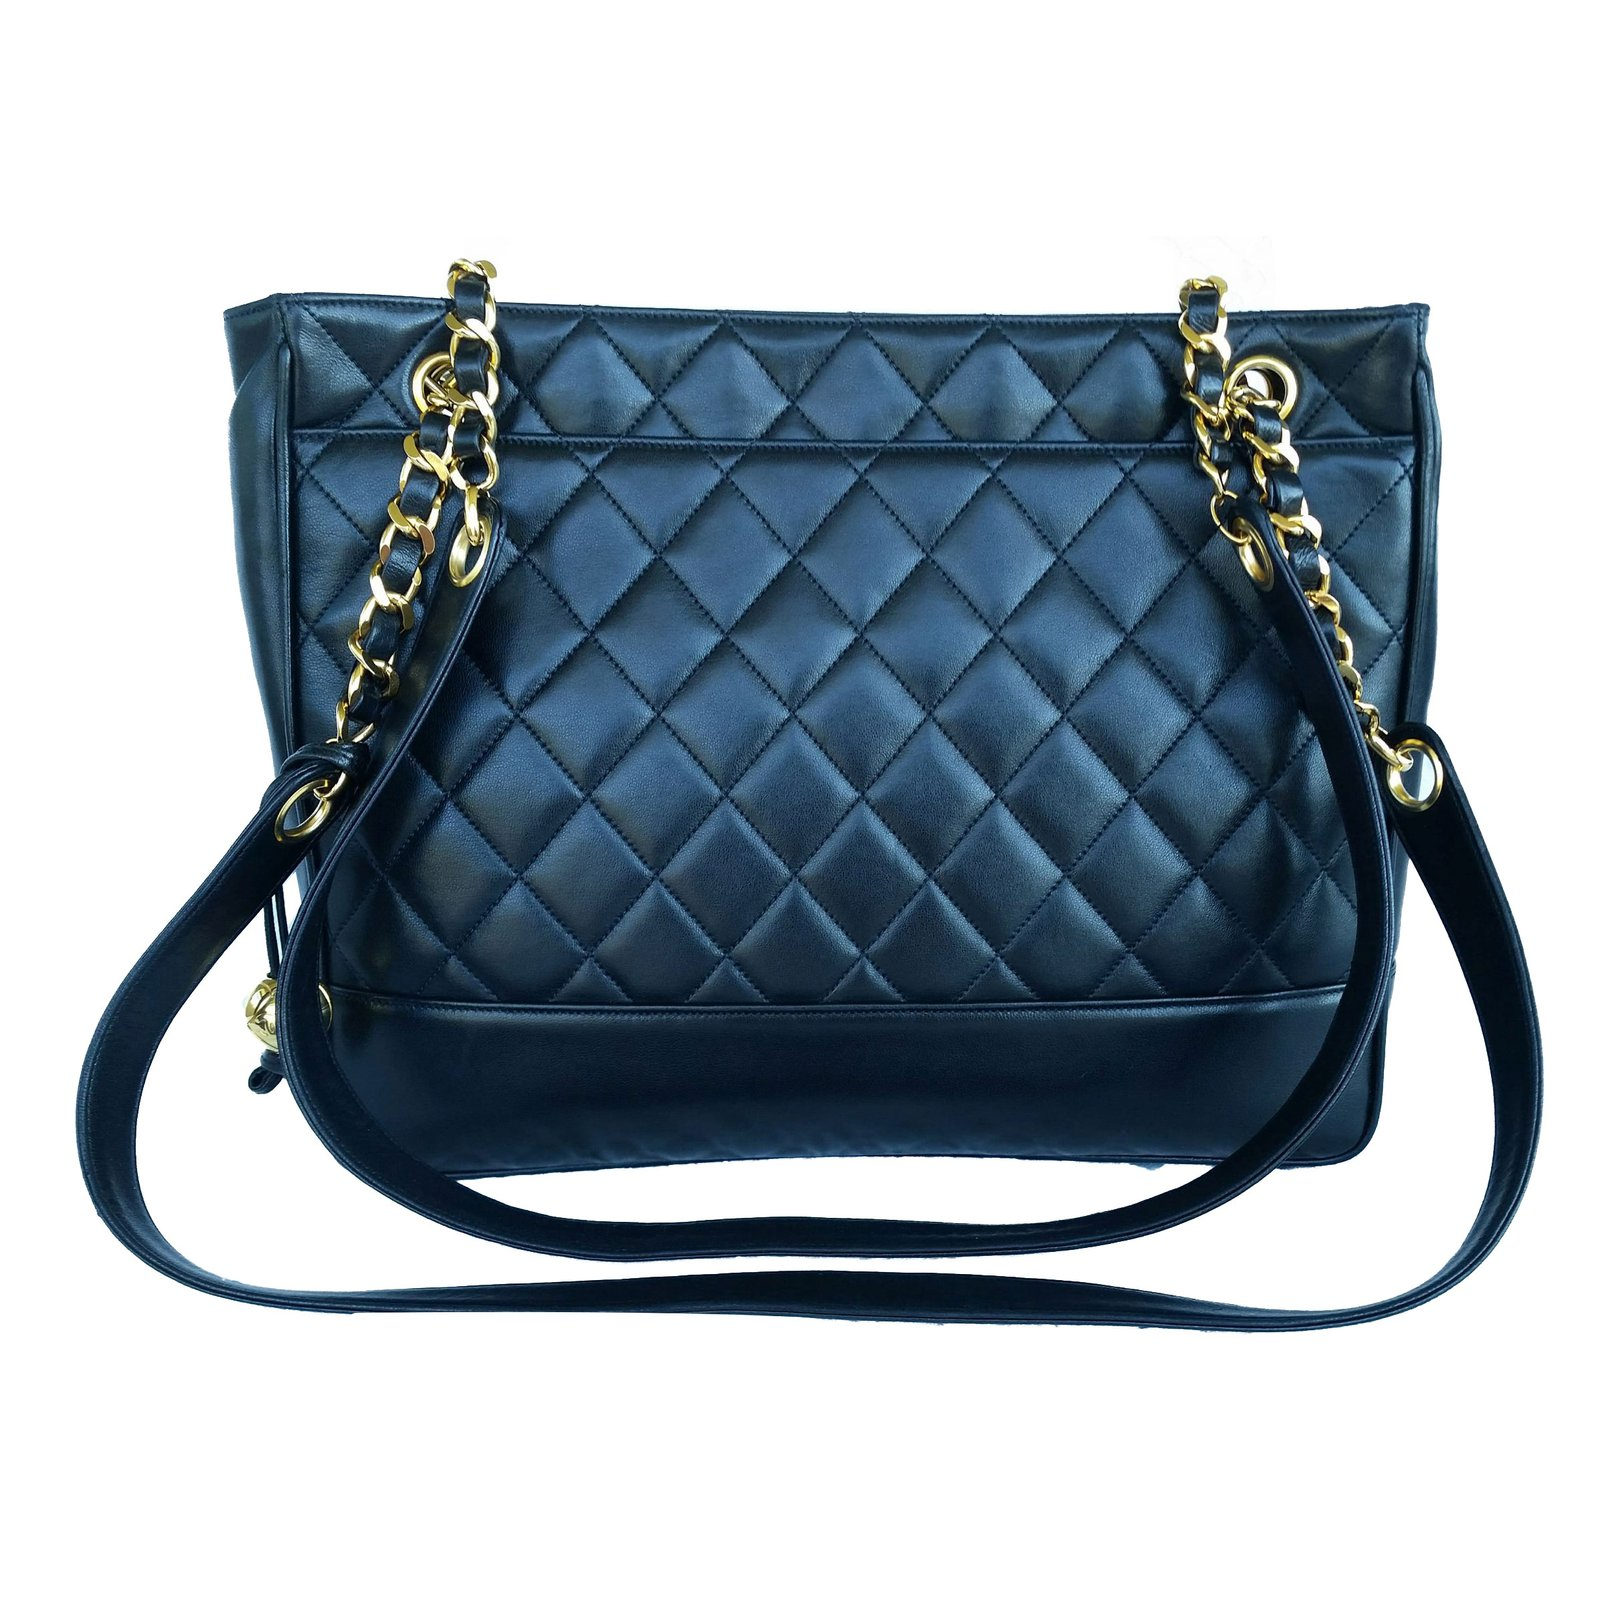 68cc36f3c2 Sacs à main Chanel Sac à main Cuir Noir ref.70659 - Joli Closet